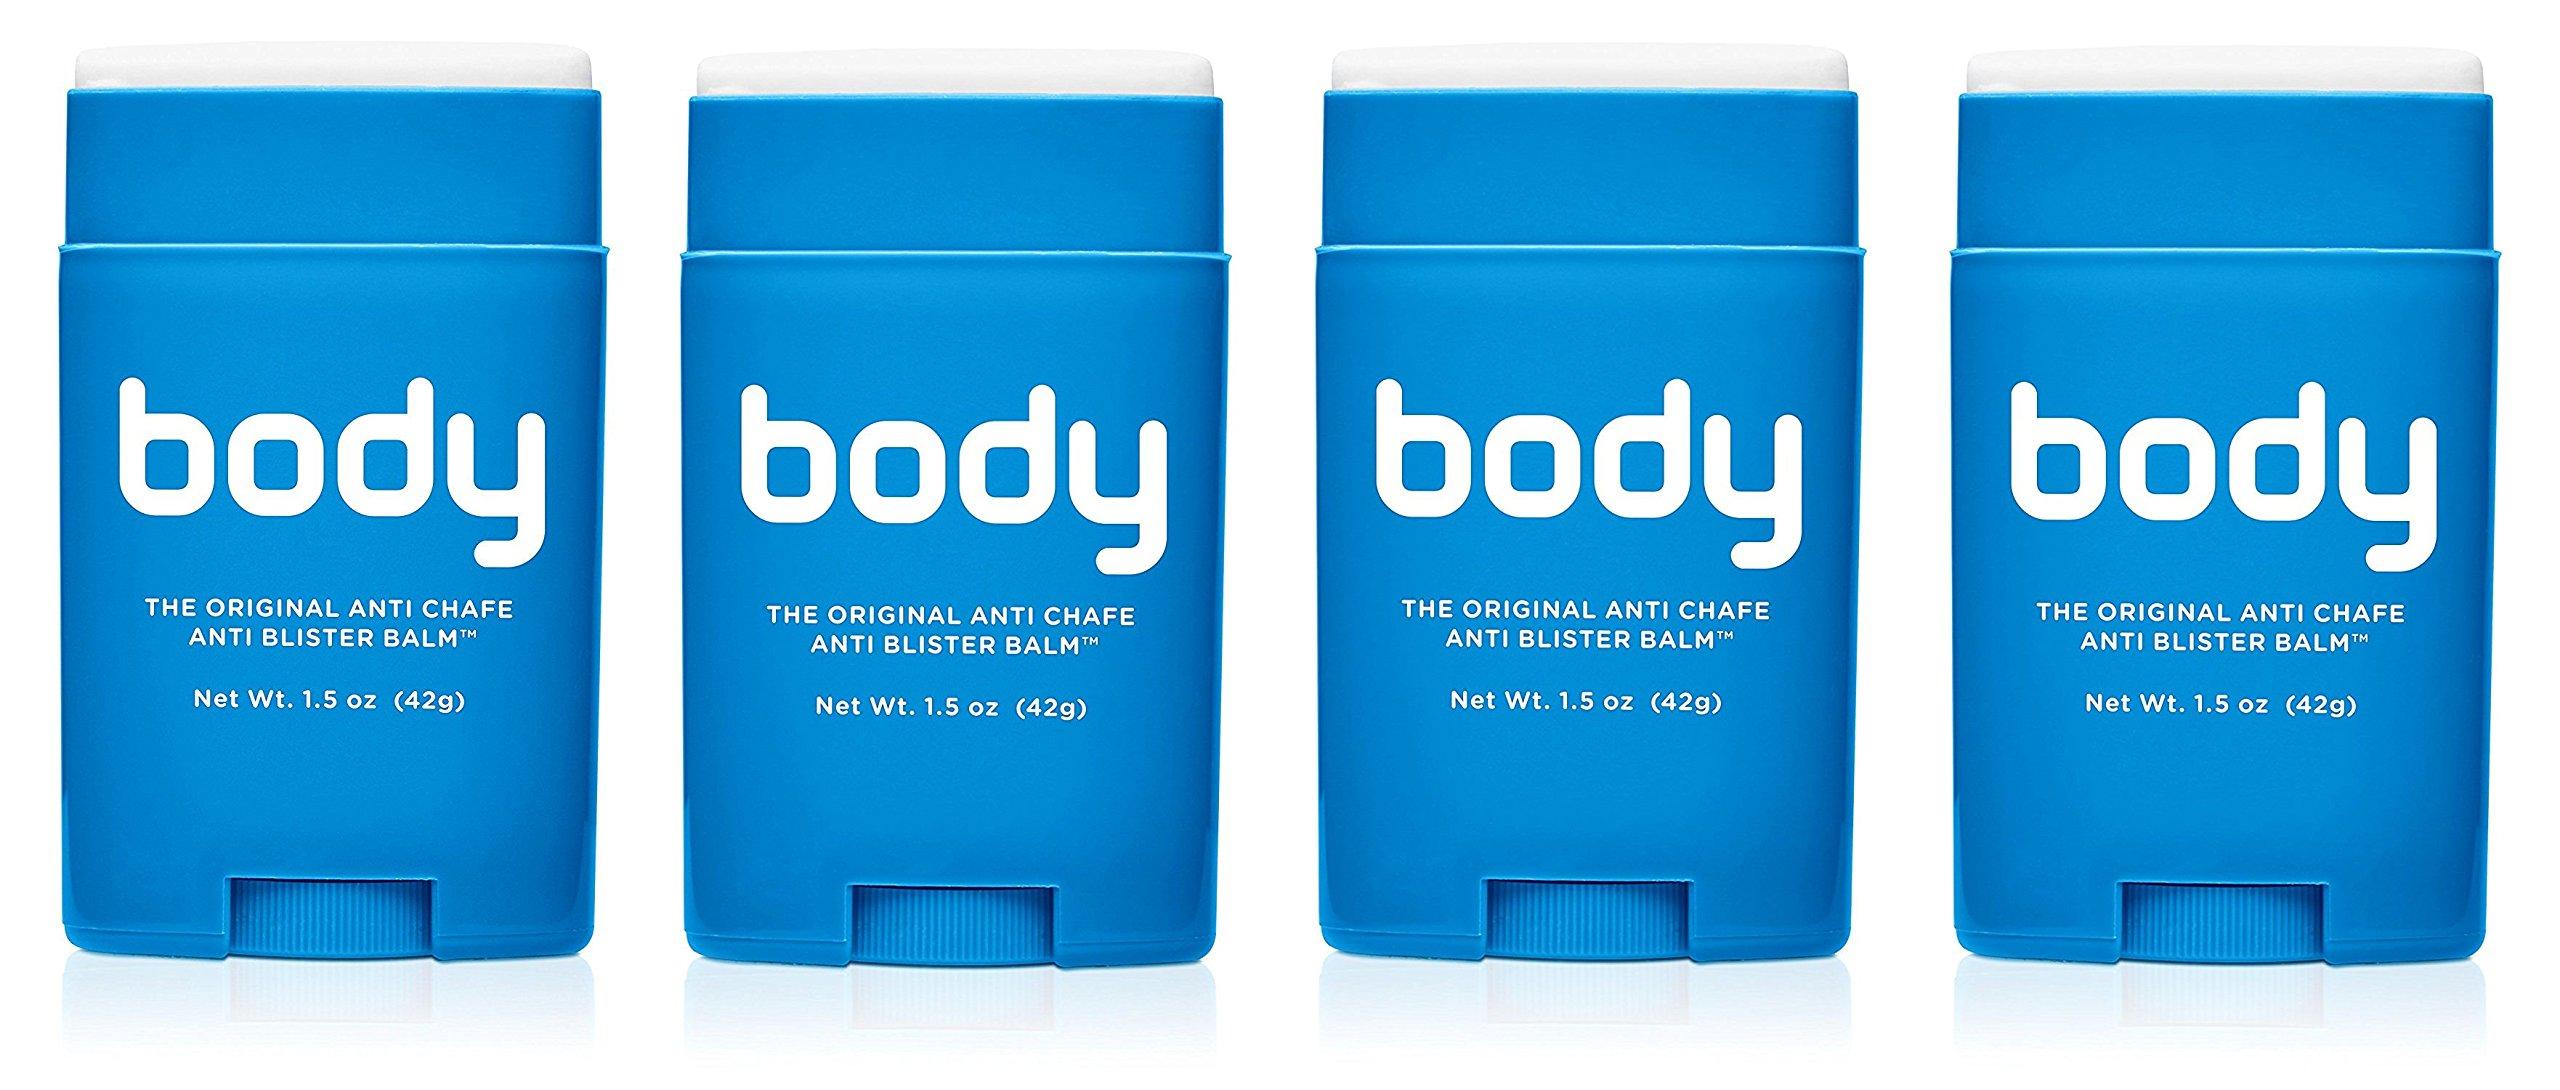 BodyGlide Original Anti-Chafe Balm, 4Pack (1.5 oz)